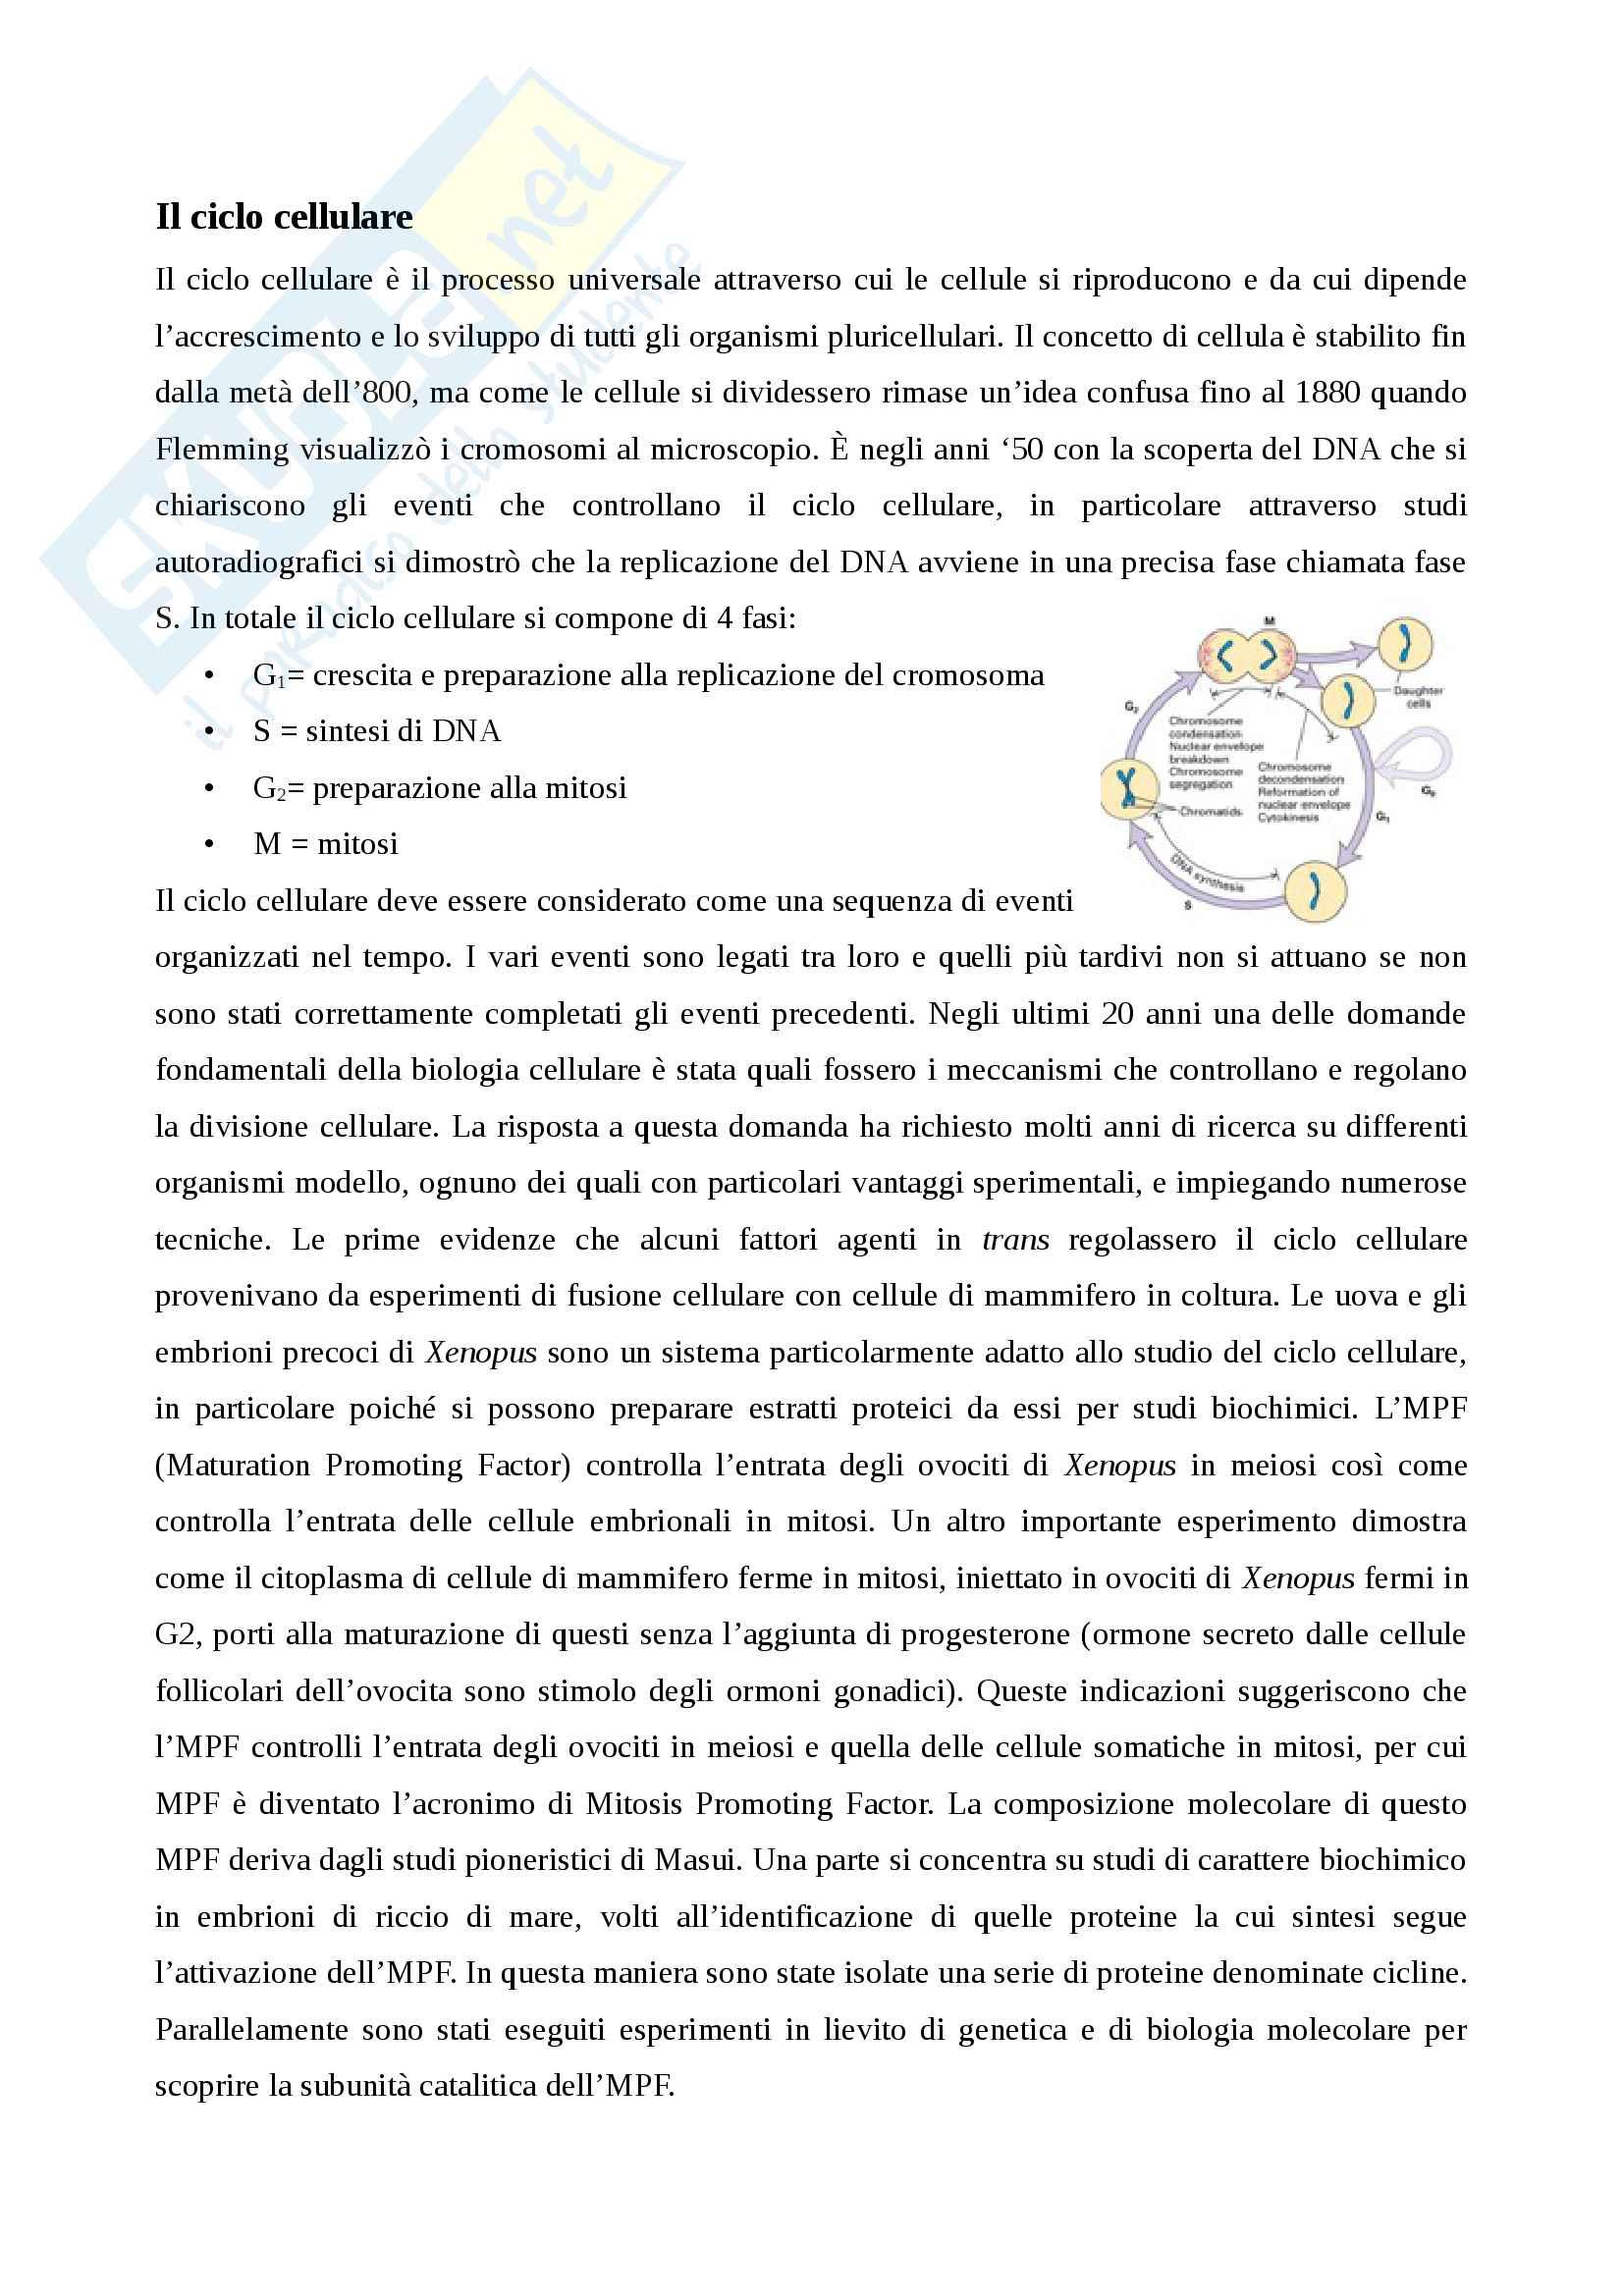 Appunti completi per l'esame di Biologia Cellulare